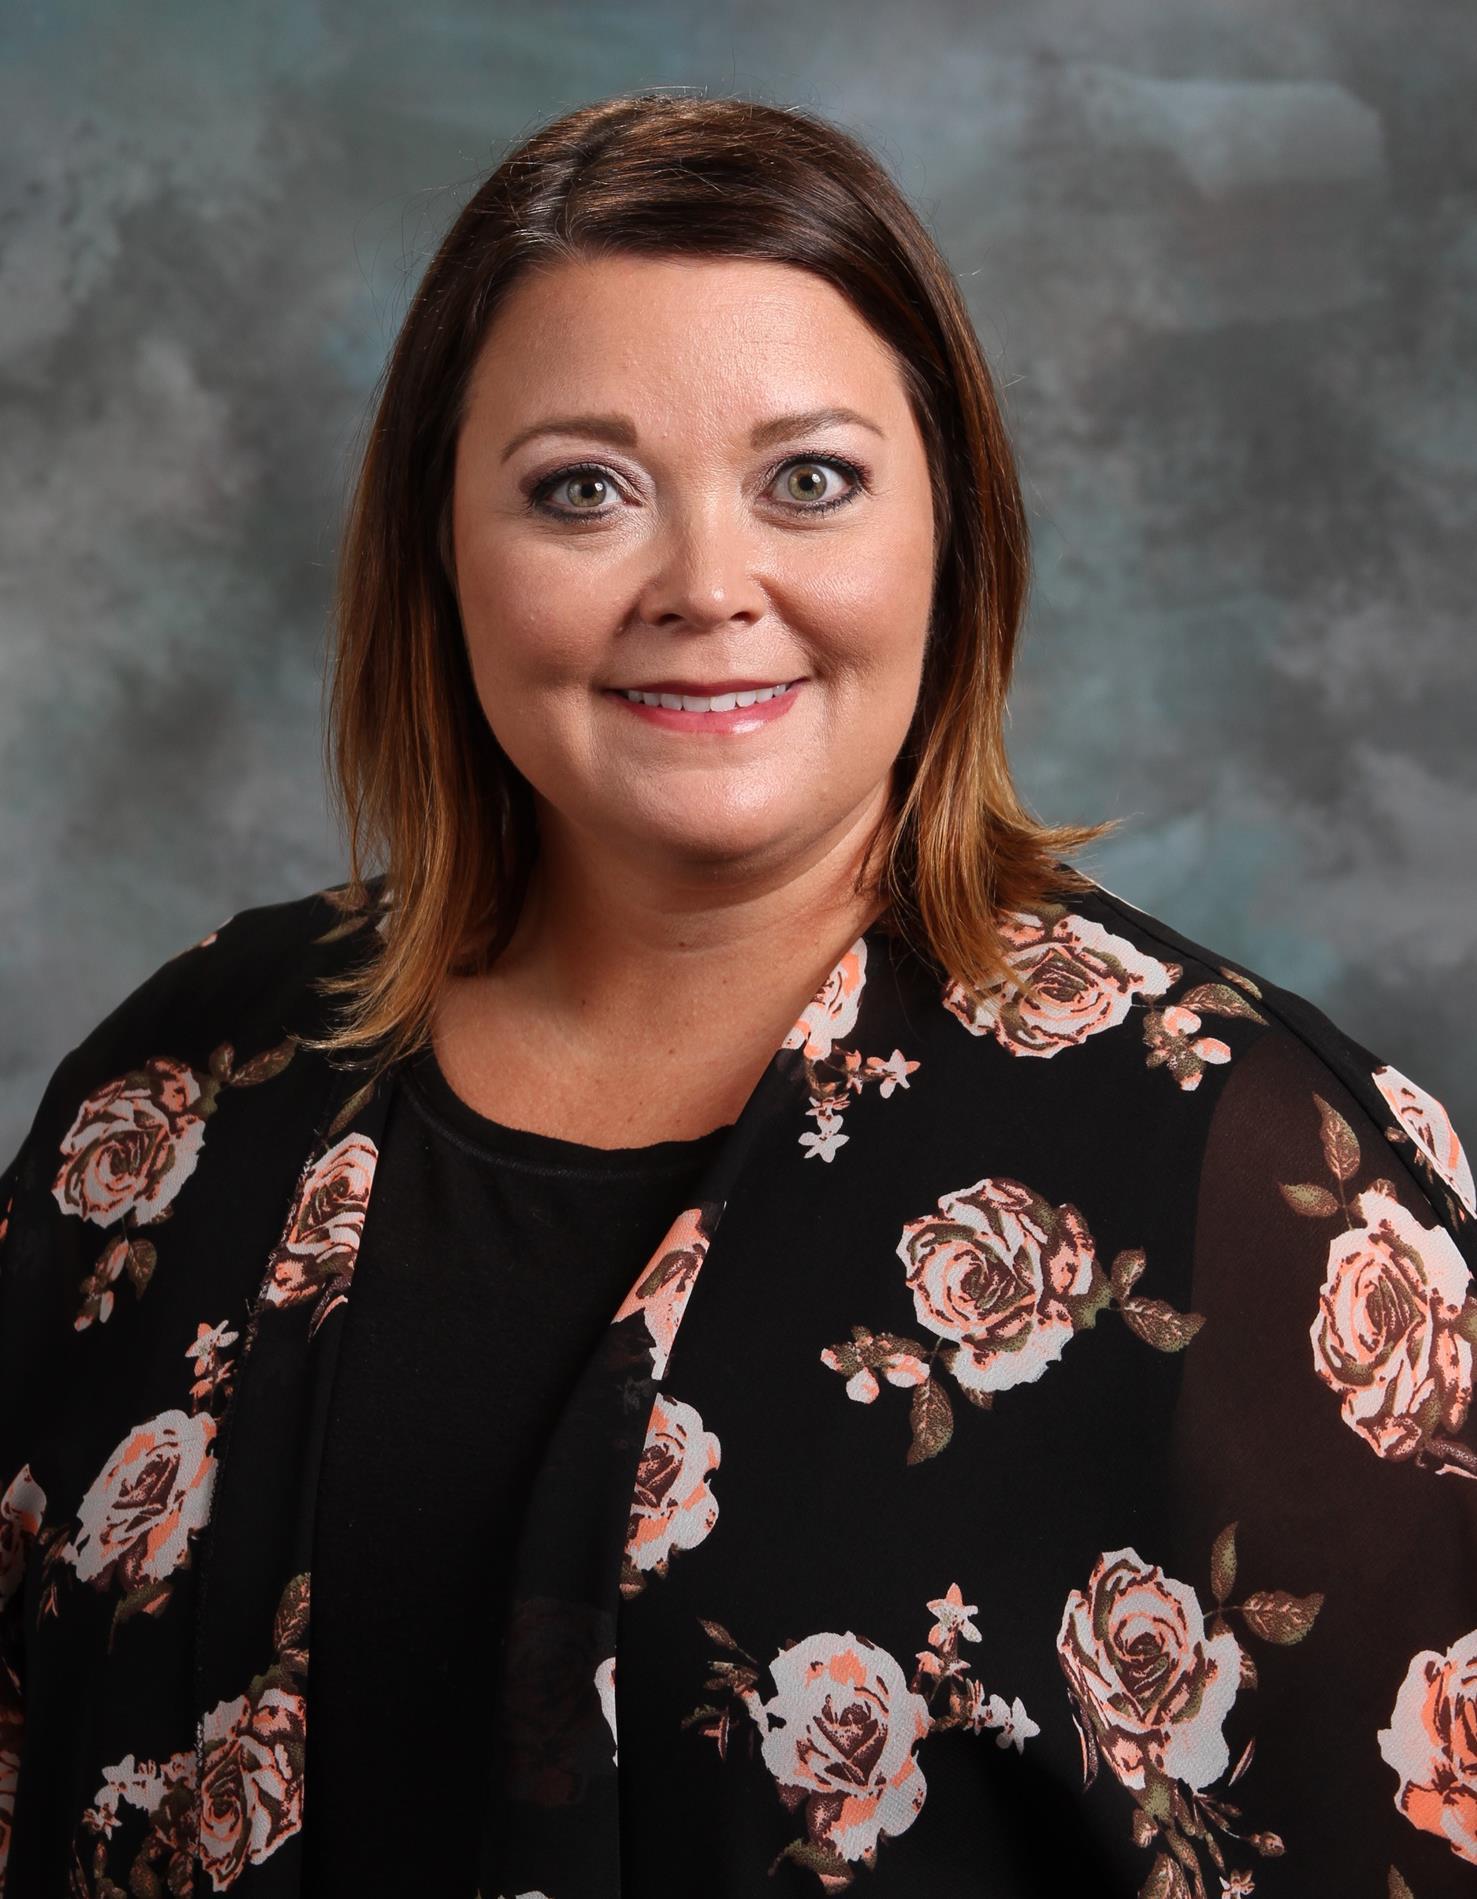 Danielle White Intended For Collier County Public School 2021 Calendar